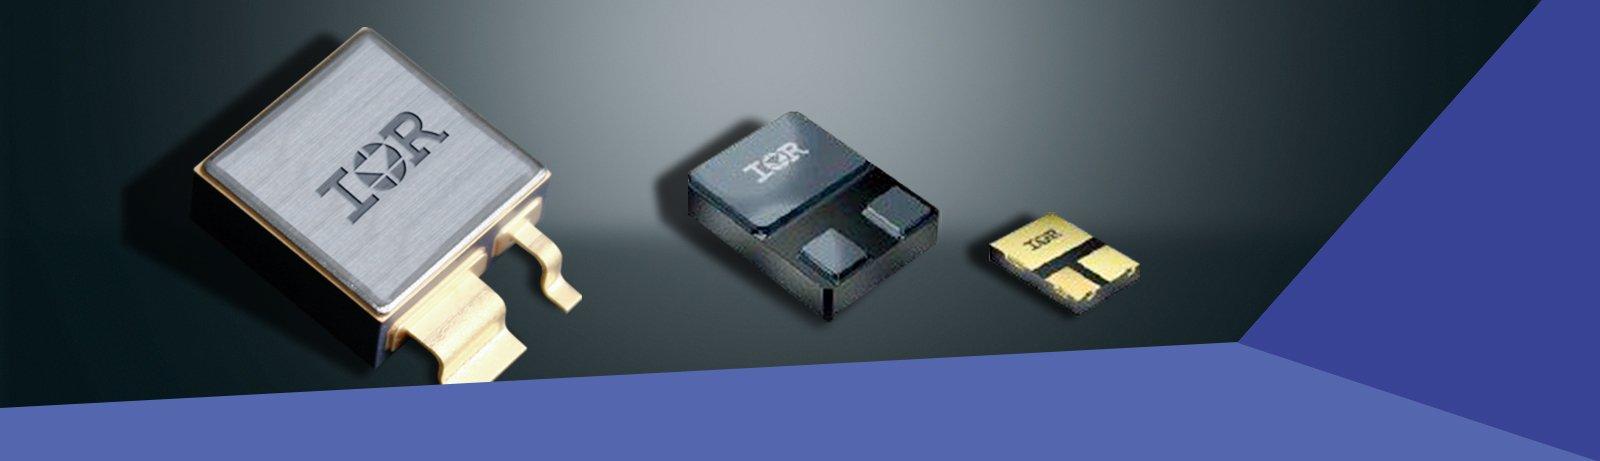 R9 strahlungsfeste MOSFET Technologie